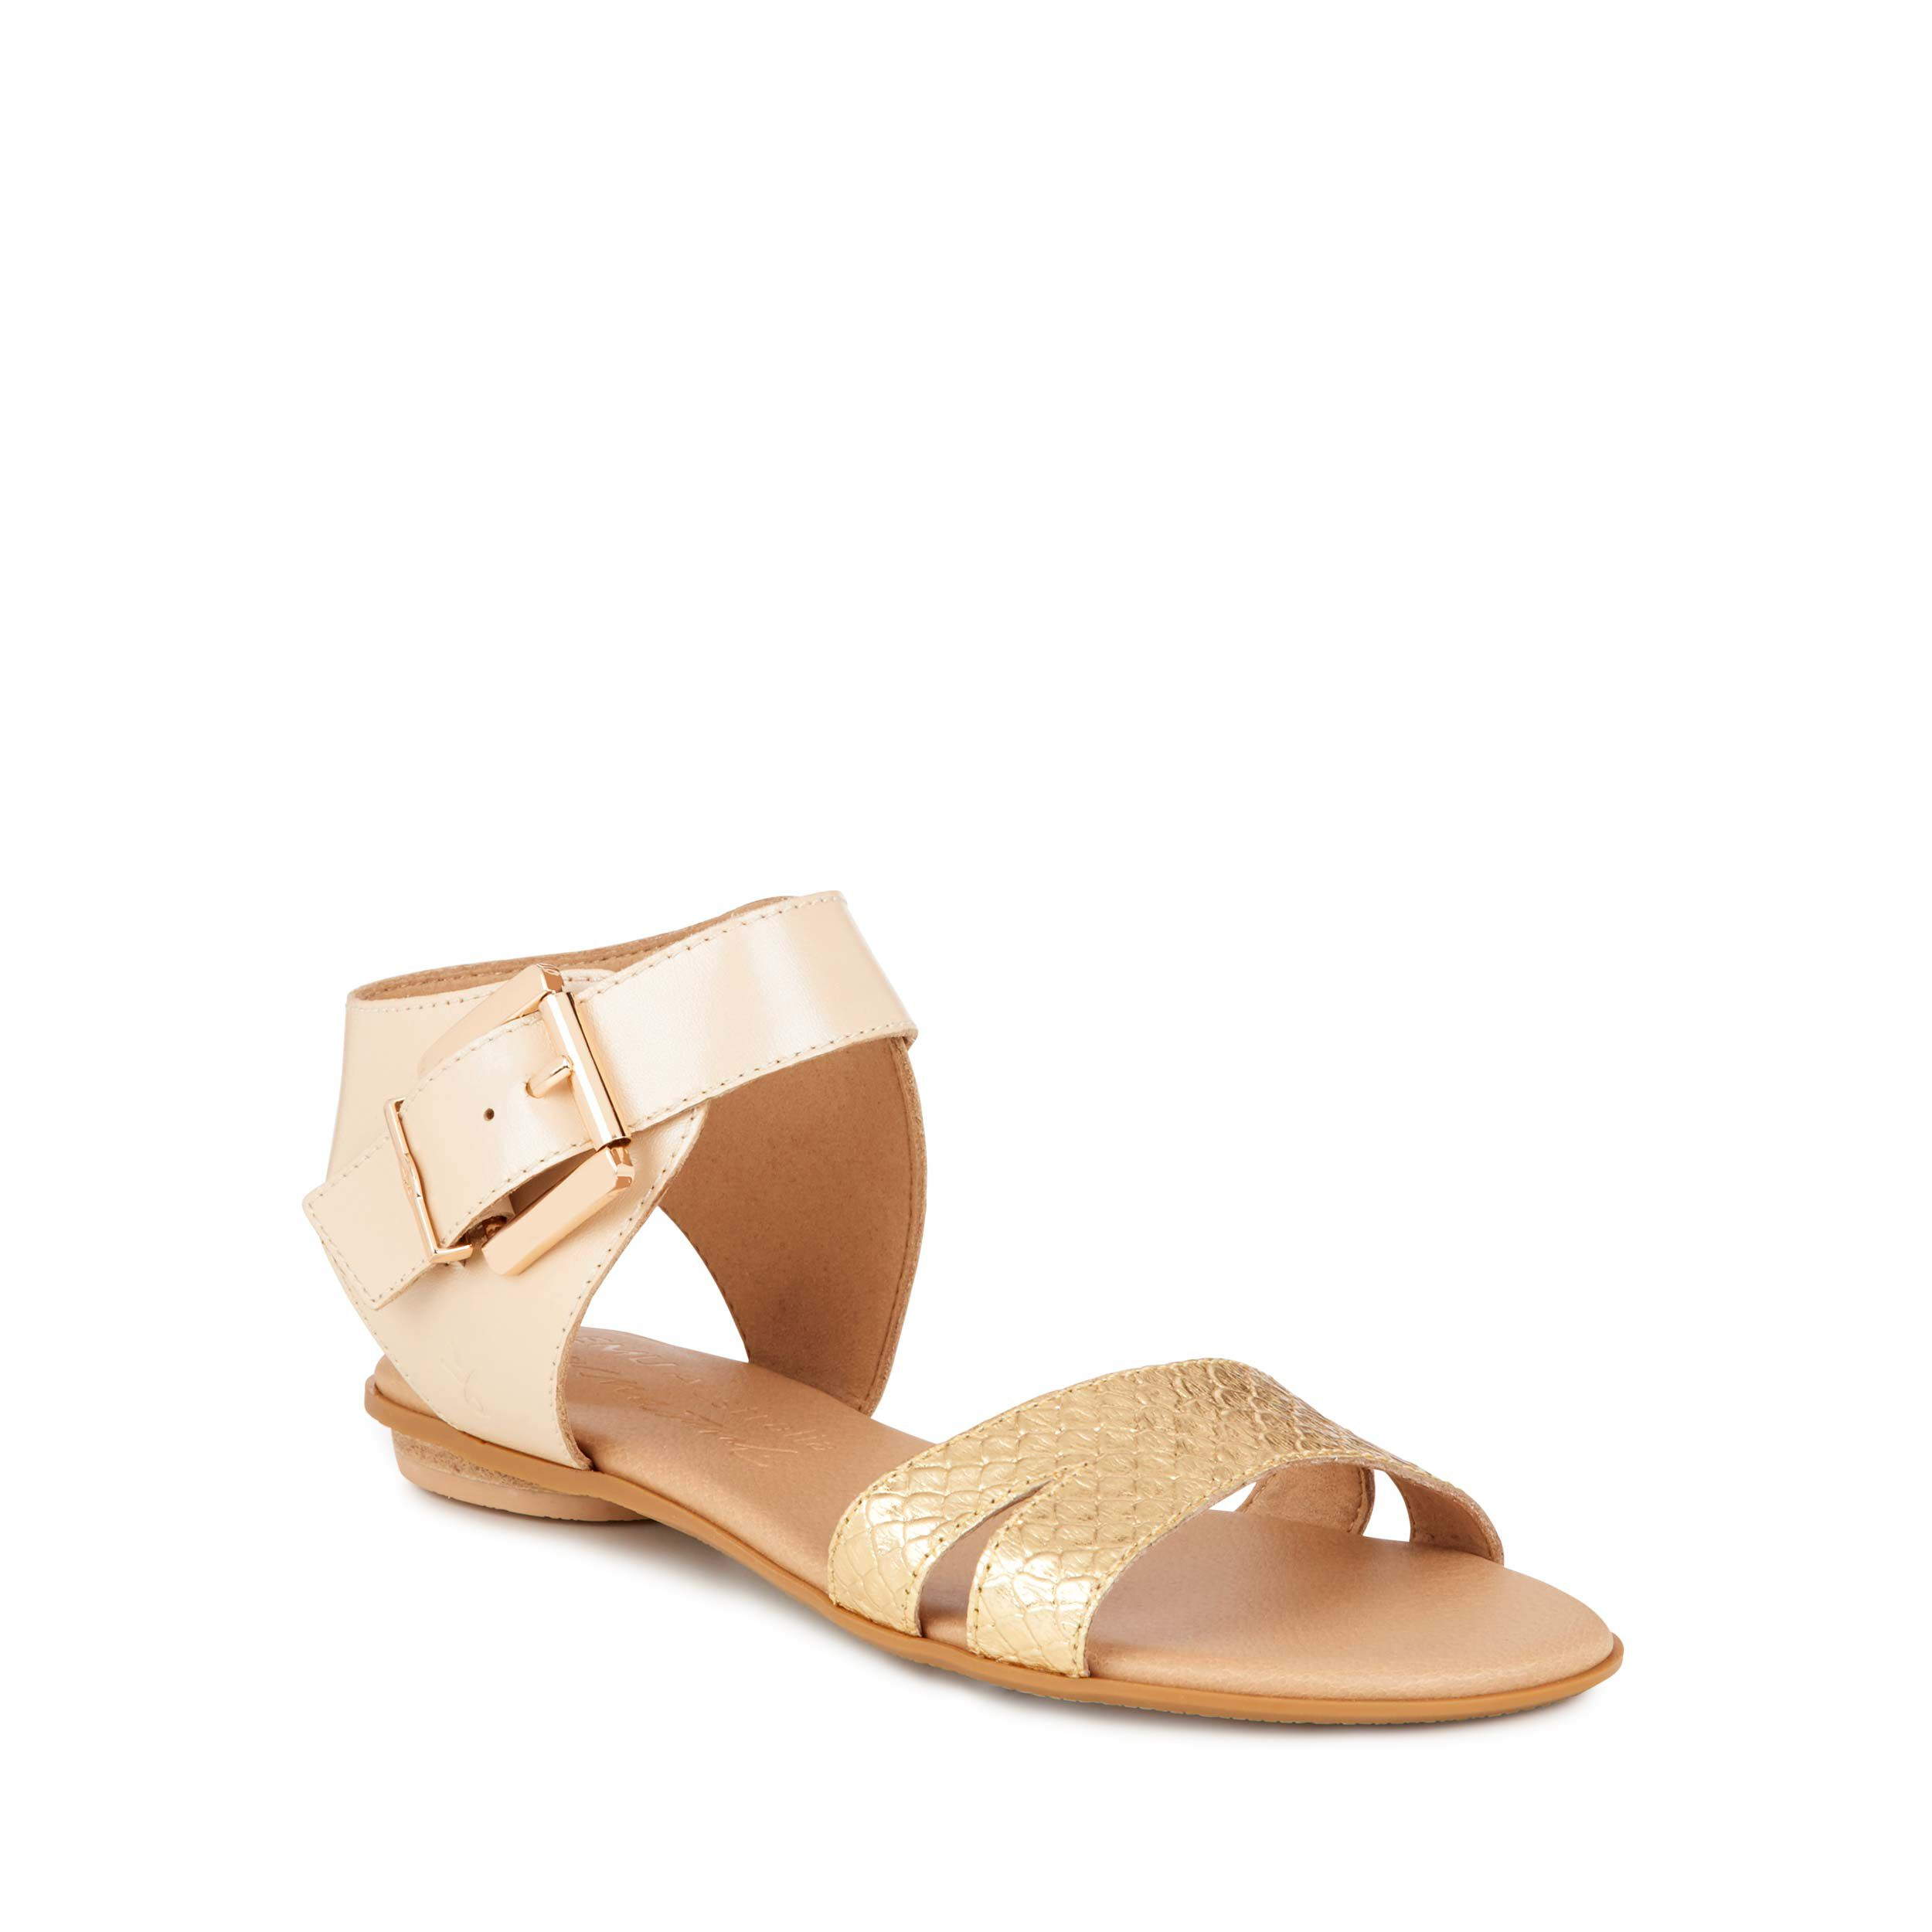 EMU Australia SAMPHIR - Sandals - almond/metallic 1mip7RO4nC